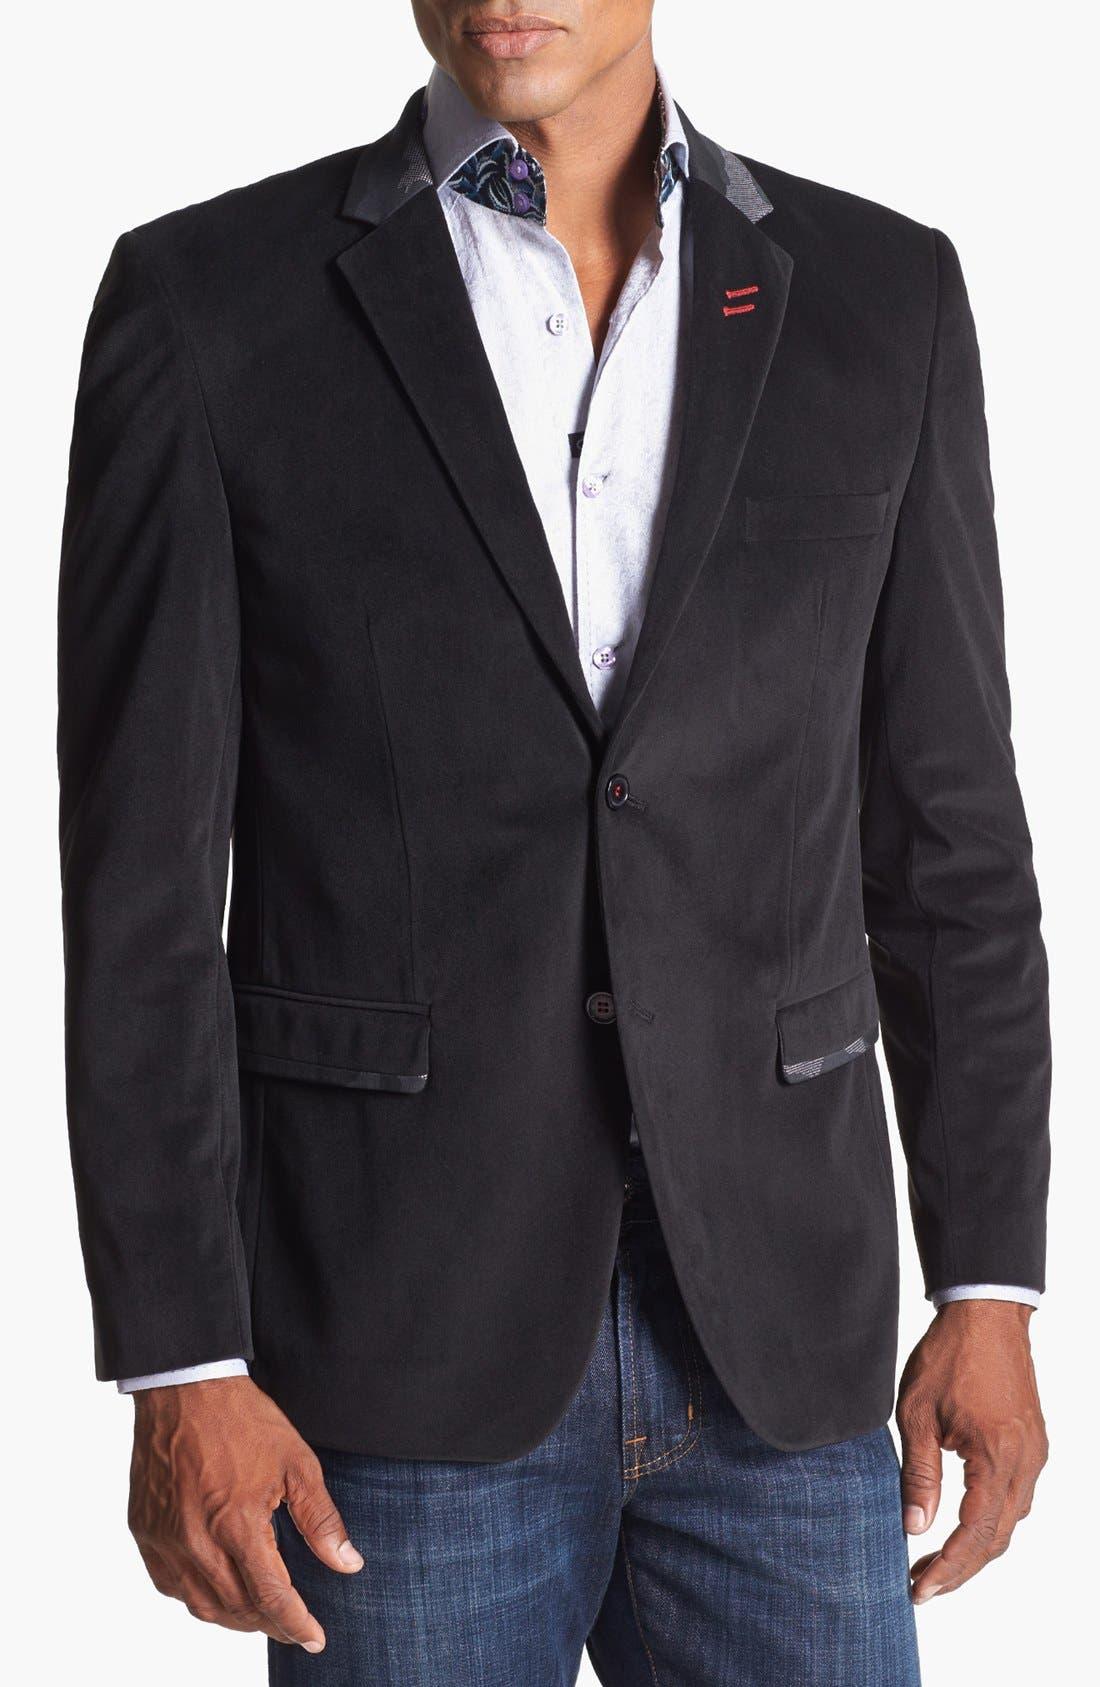 Alternate Image 1 Selected - Bogosse 'Adams' Sportcoat